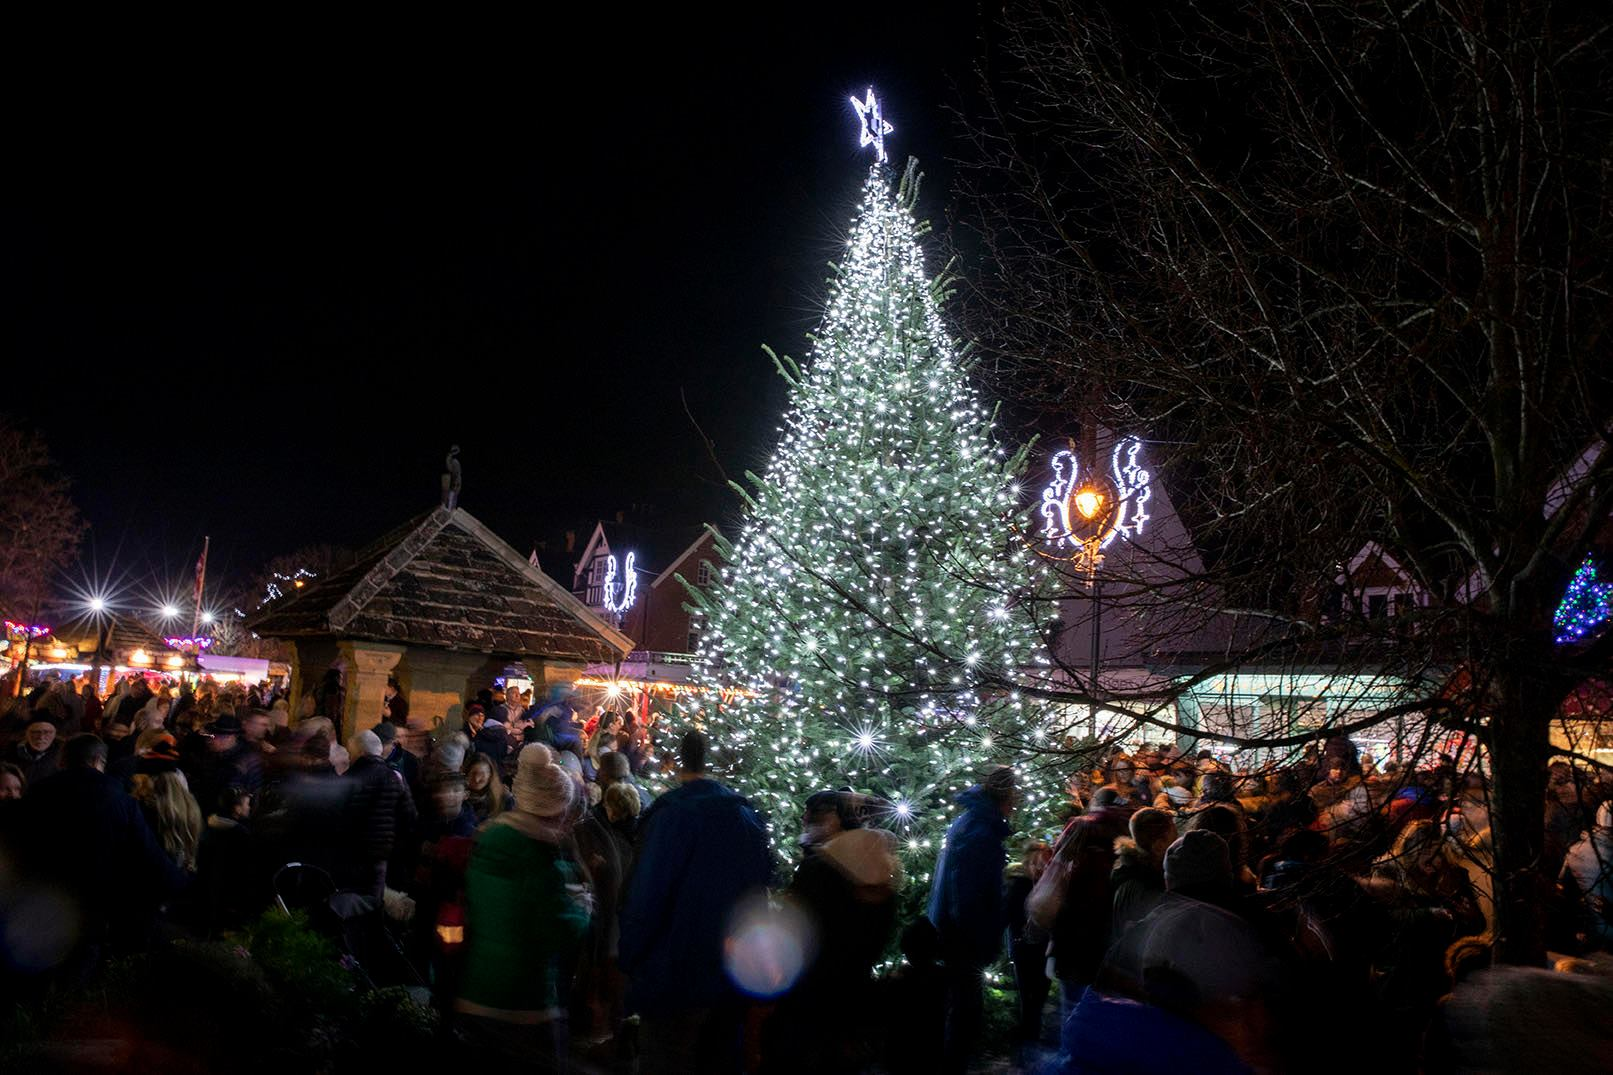 Cranleigh Christmas Lights 2020